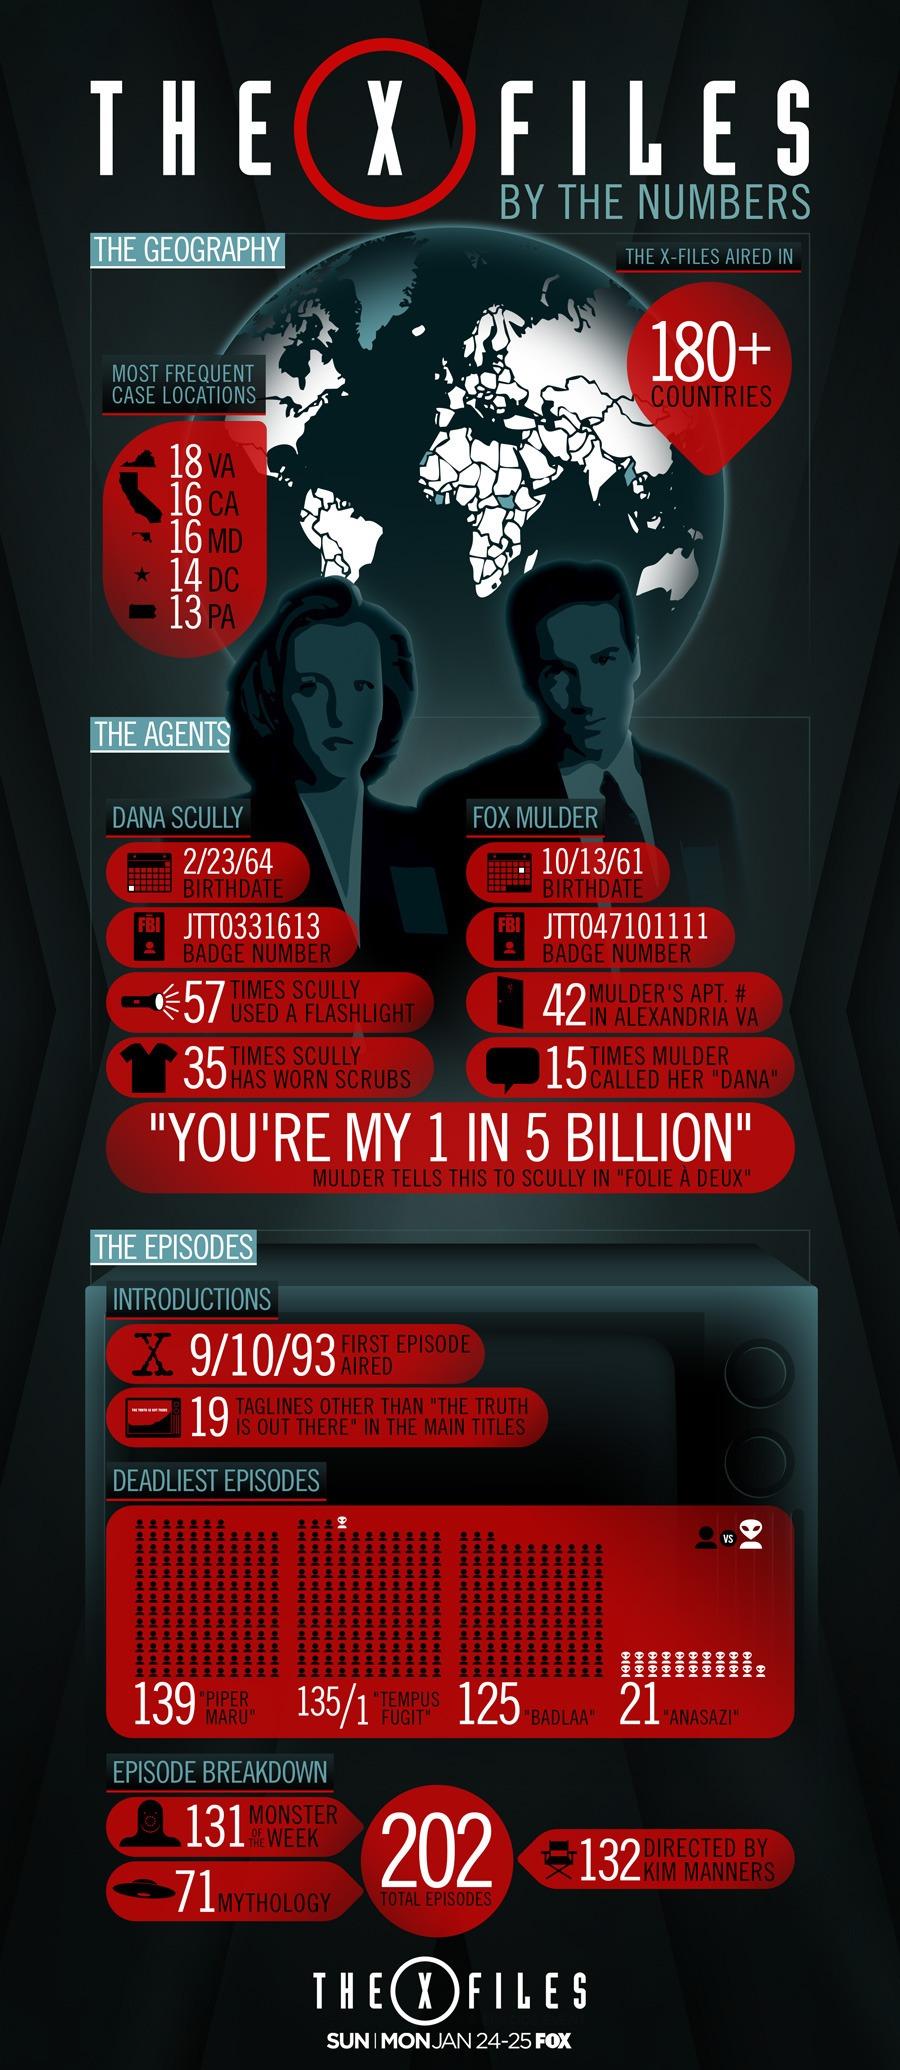 X-Files infographic